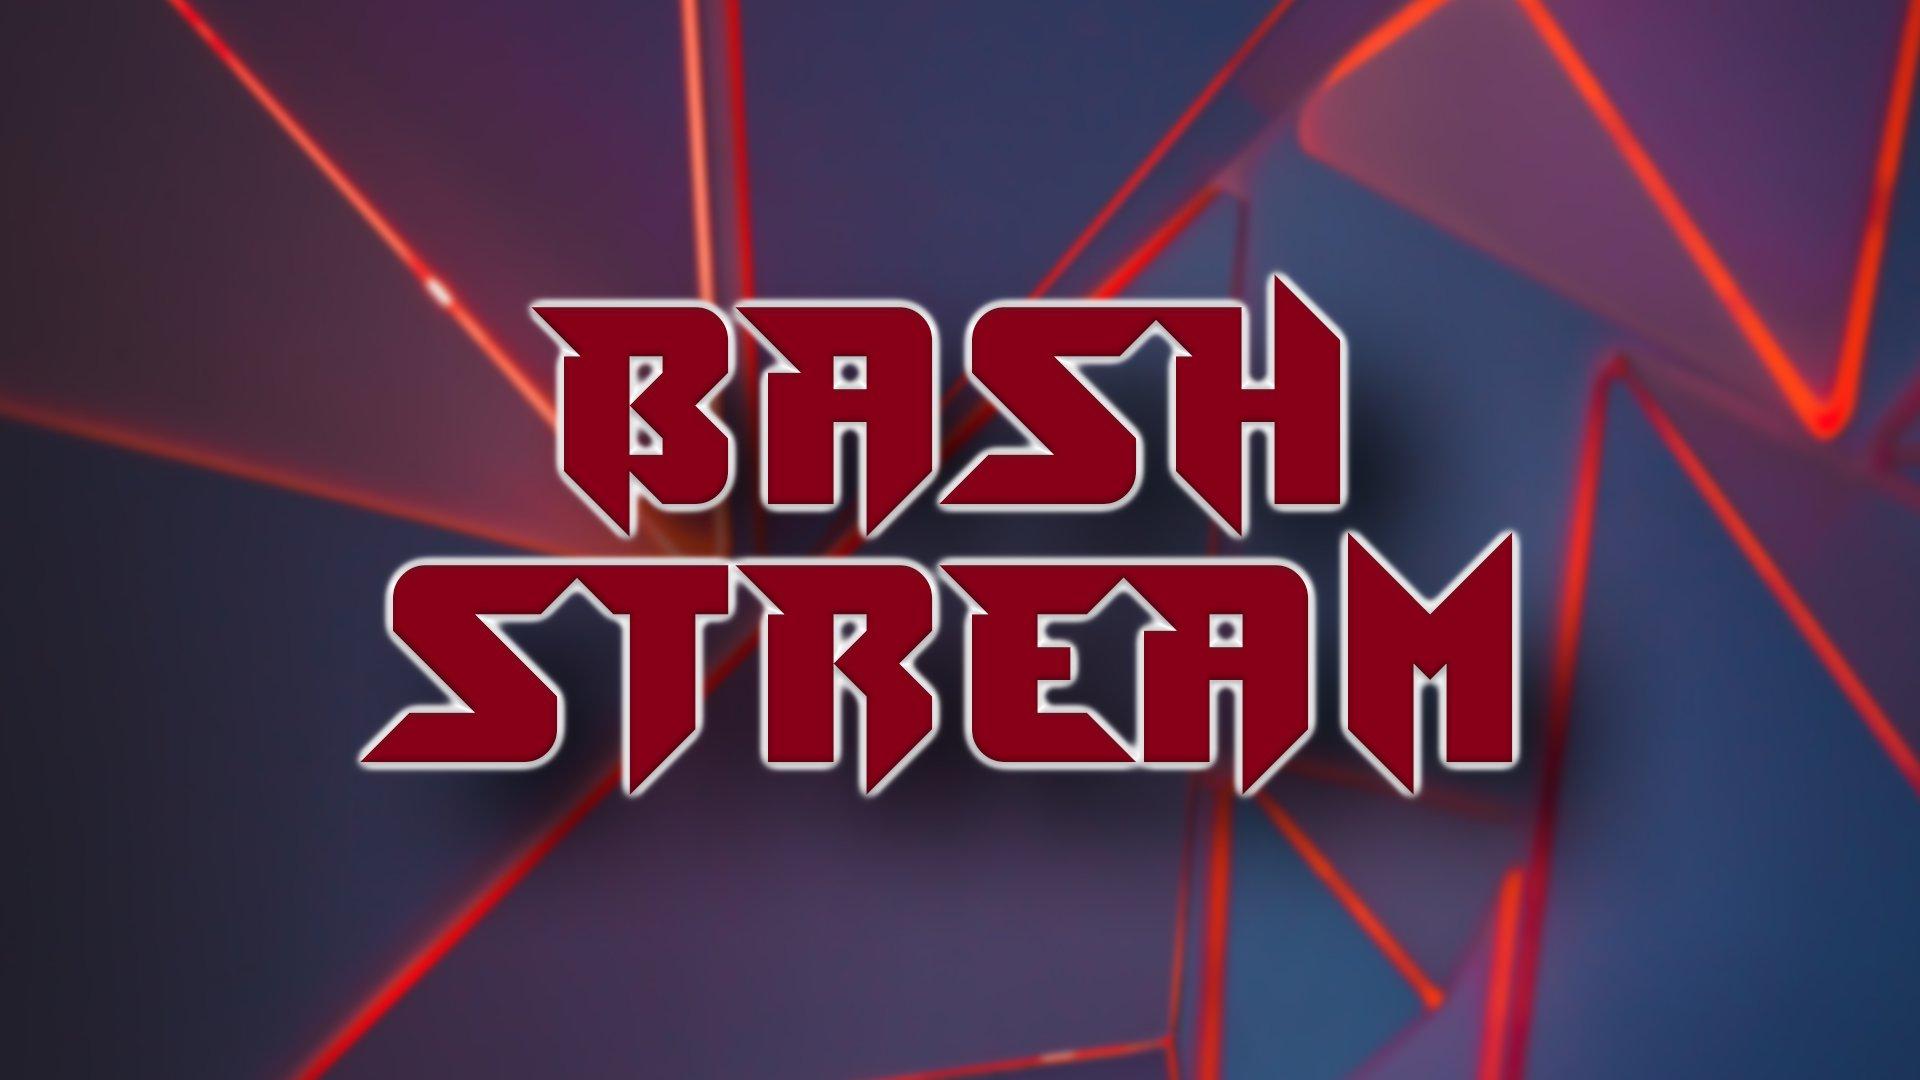 Twitch stream of BashStream